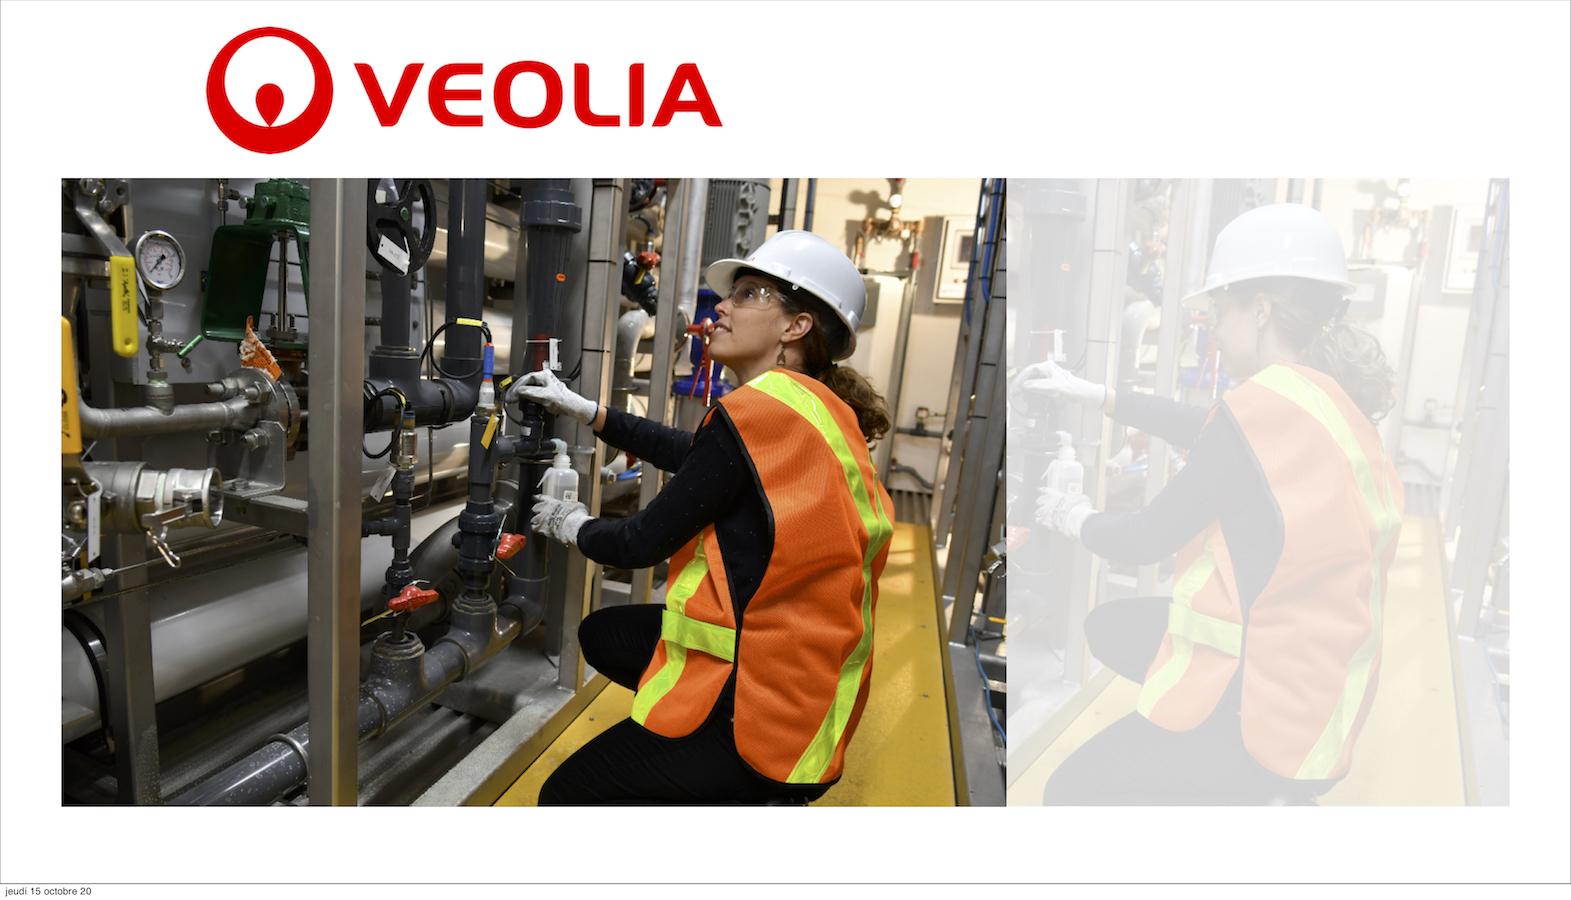 Veolia DemoPic (glissé(e)s)